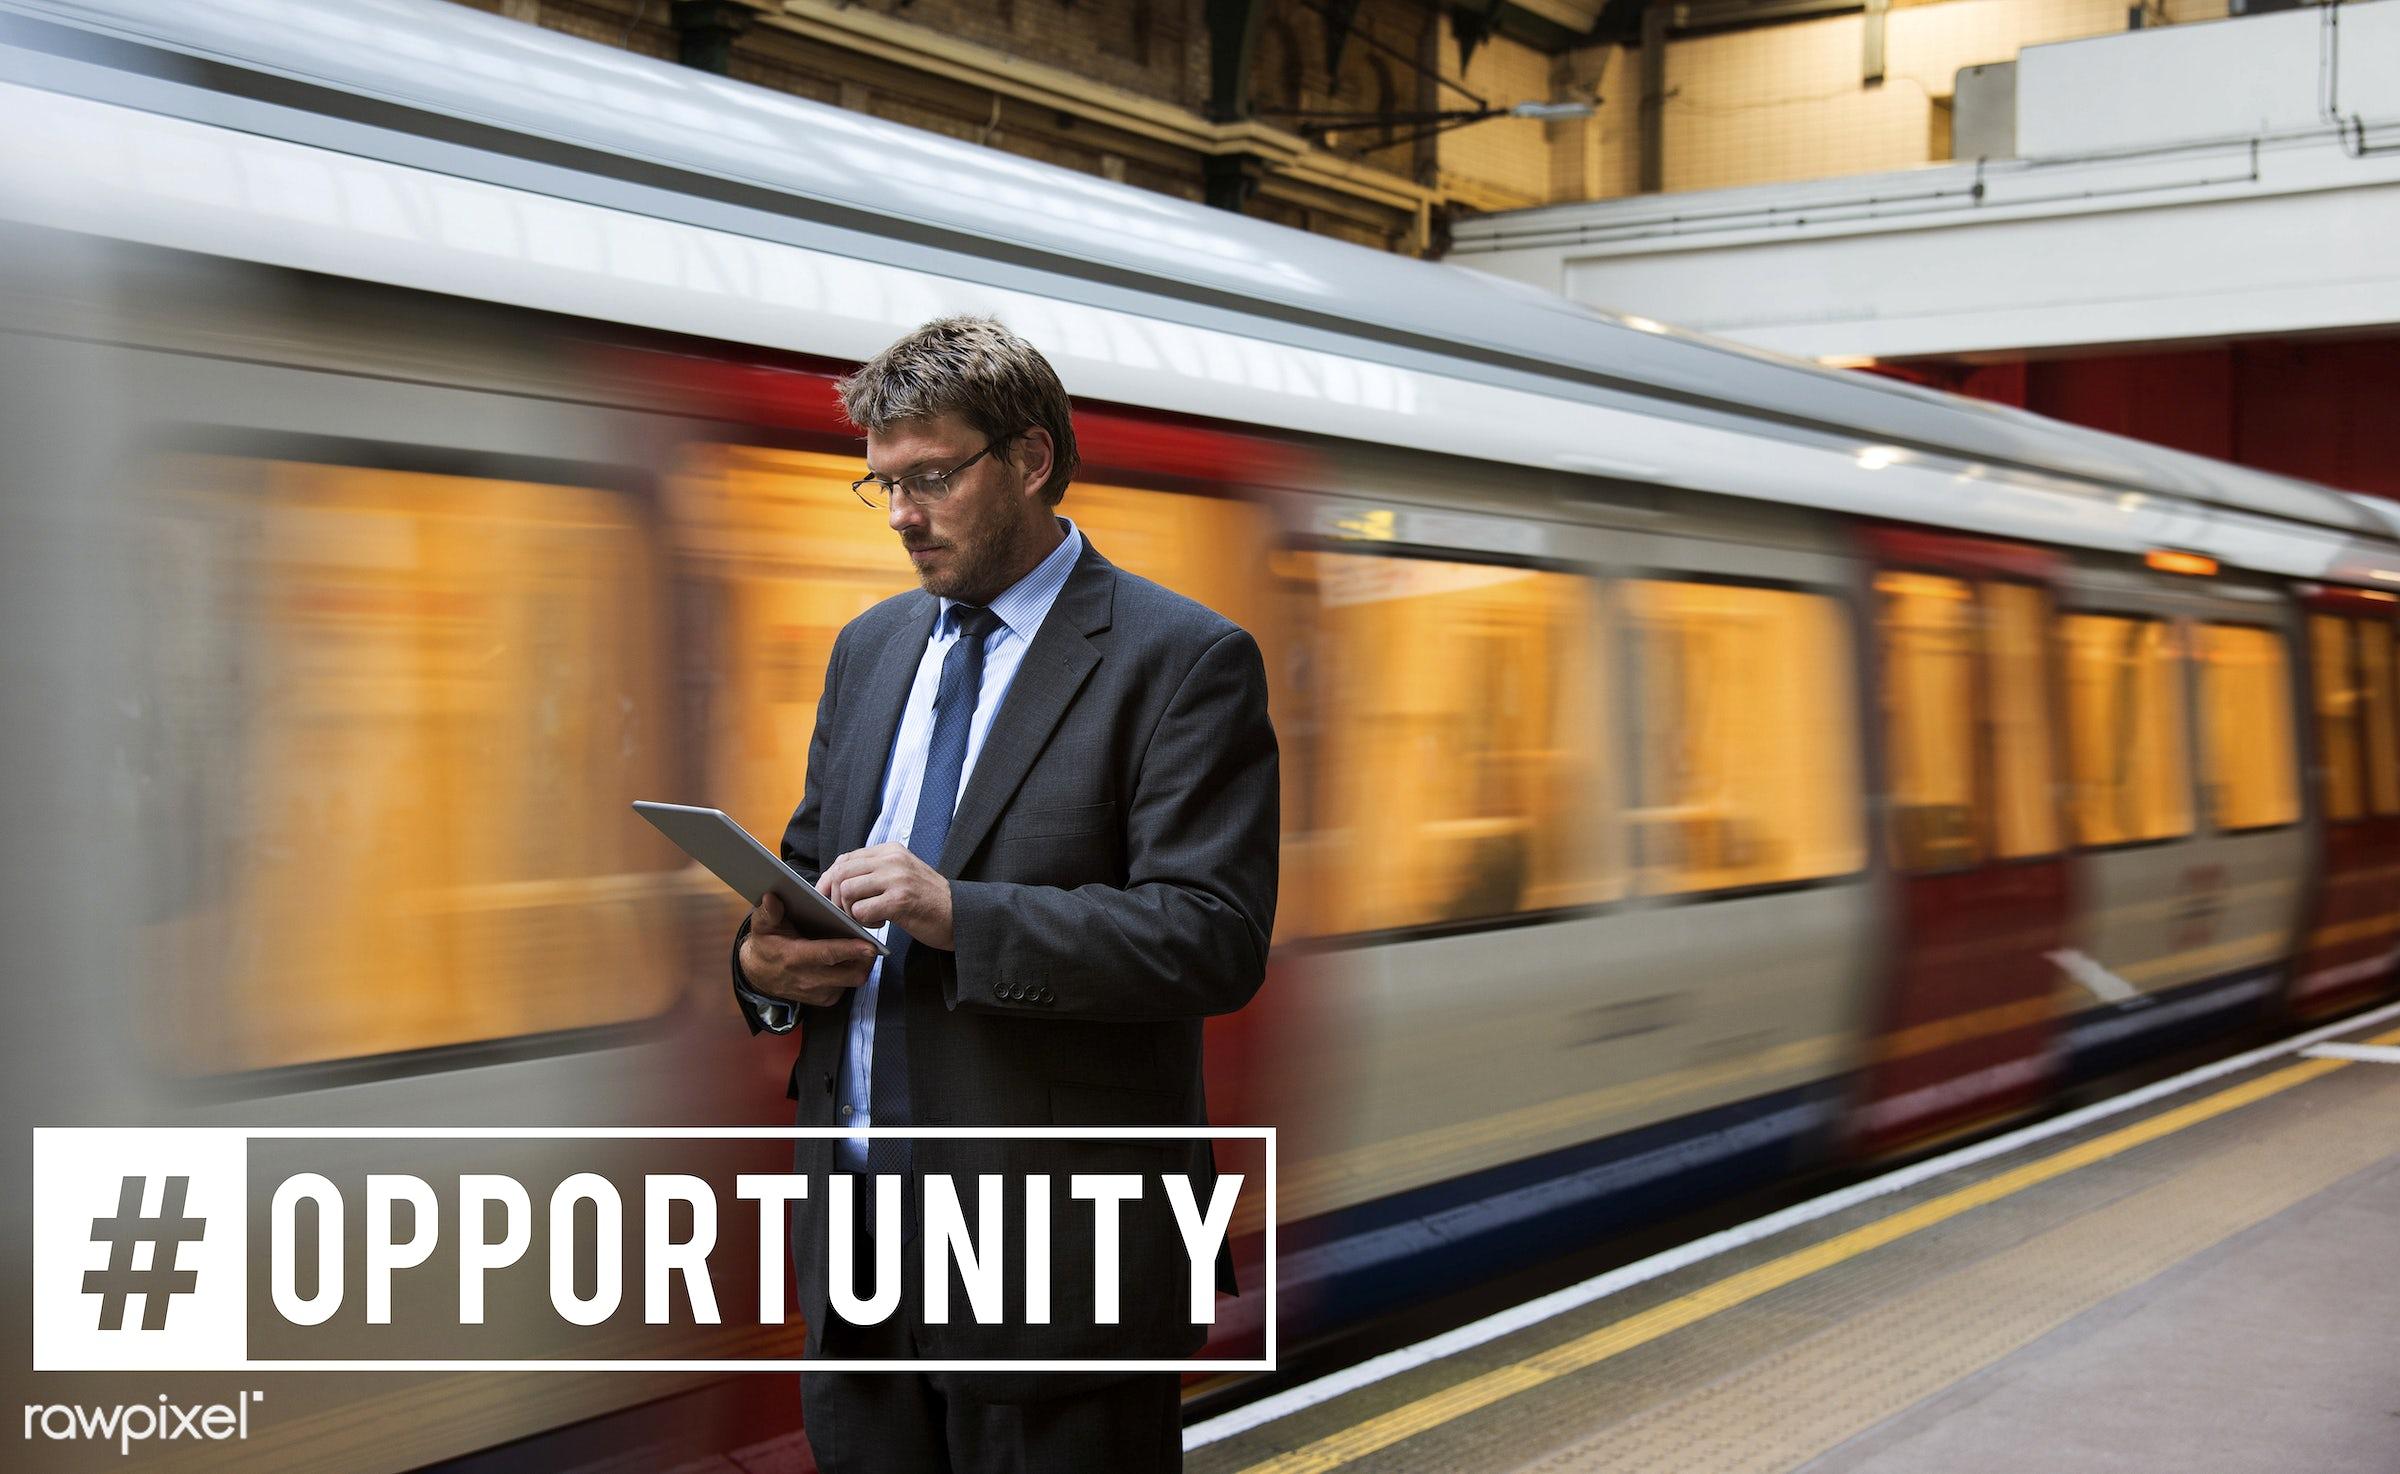 business, businessmen, device, digital, digital device, digital tablet, london, man, men, moving, subway, suit, suit and tie...